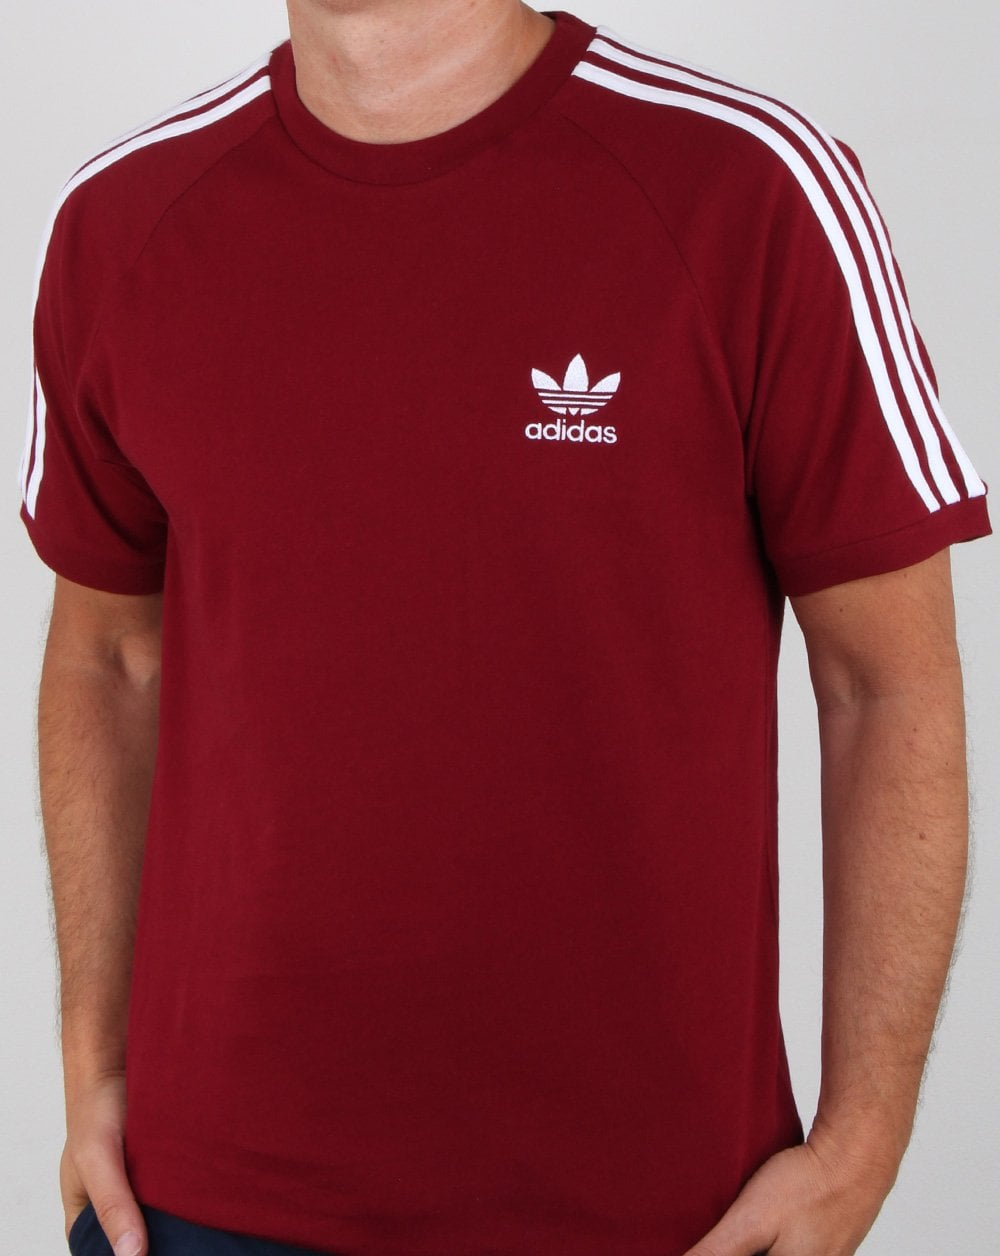 Adidas Originals 3 Stripes T shirt Collegiate Burgundy